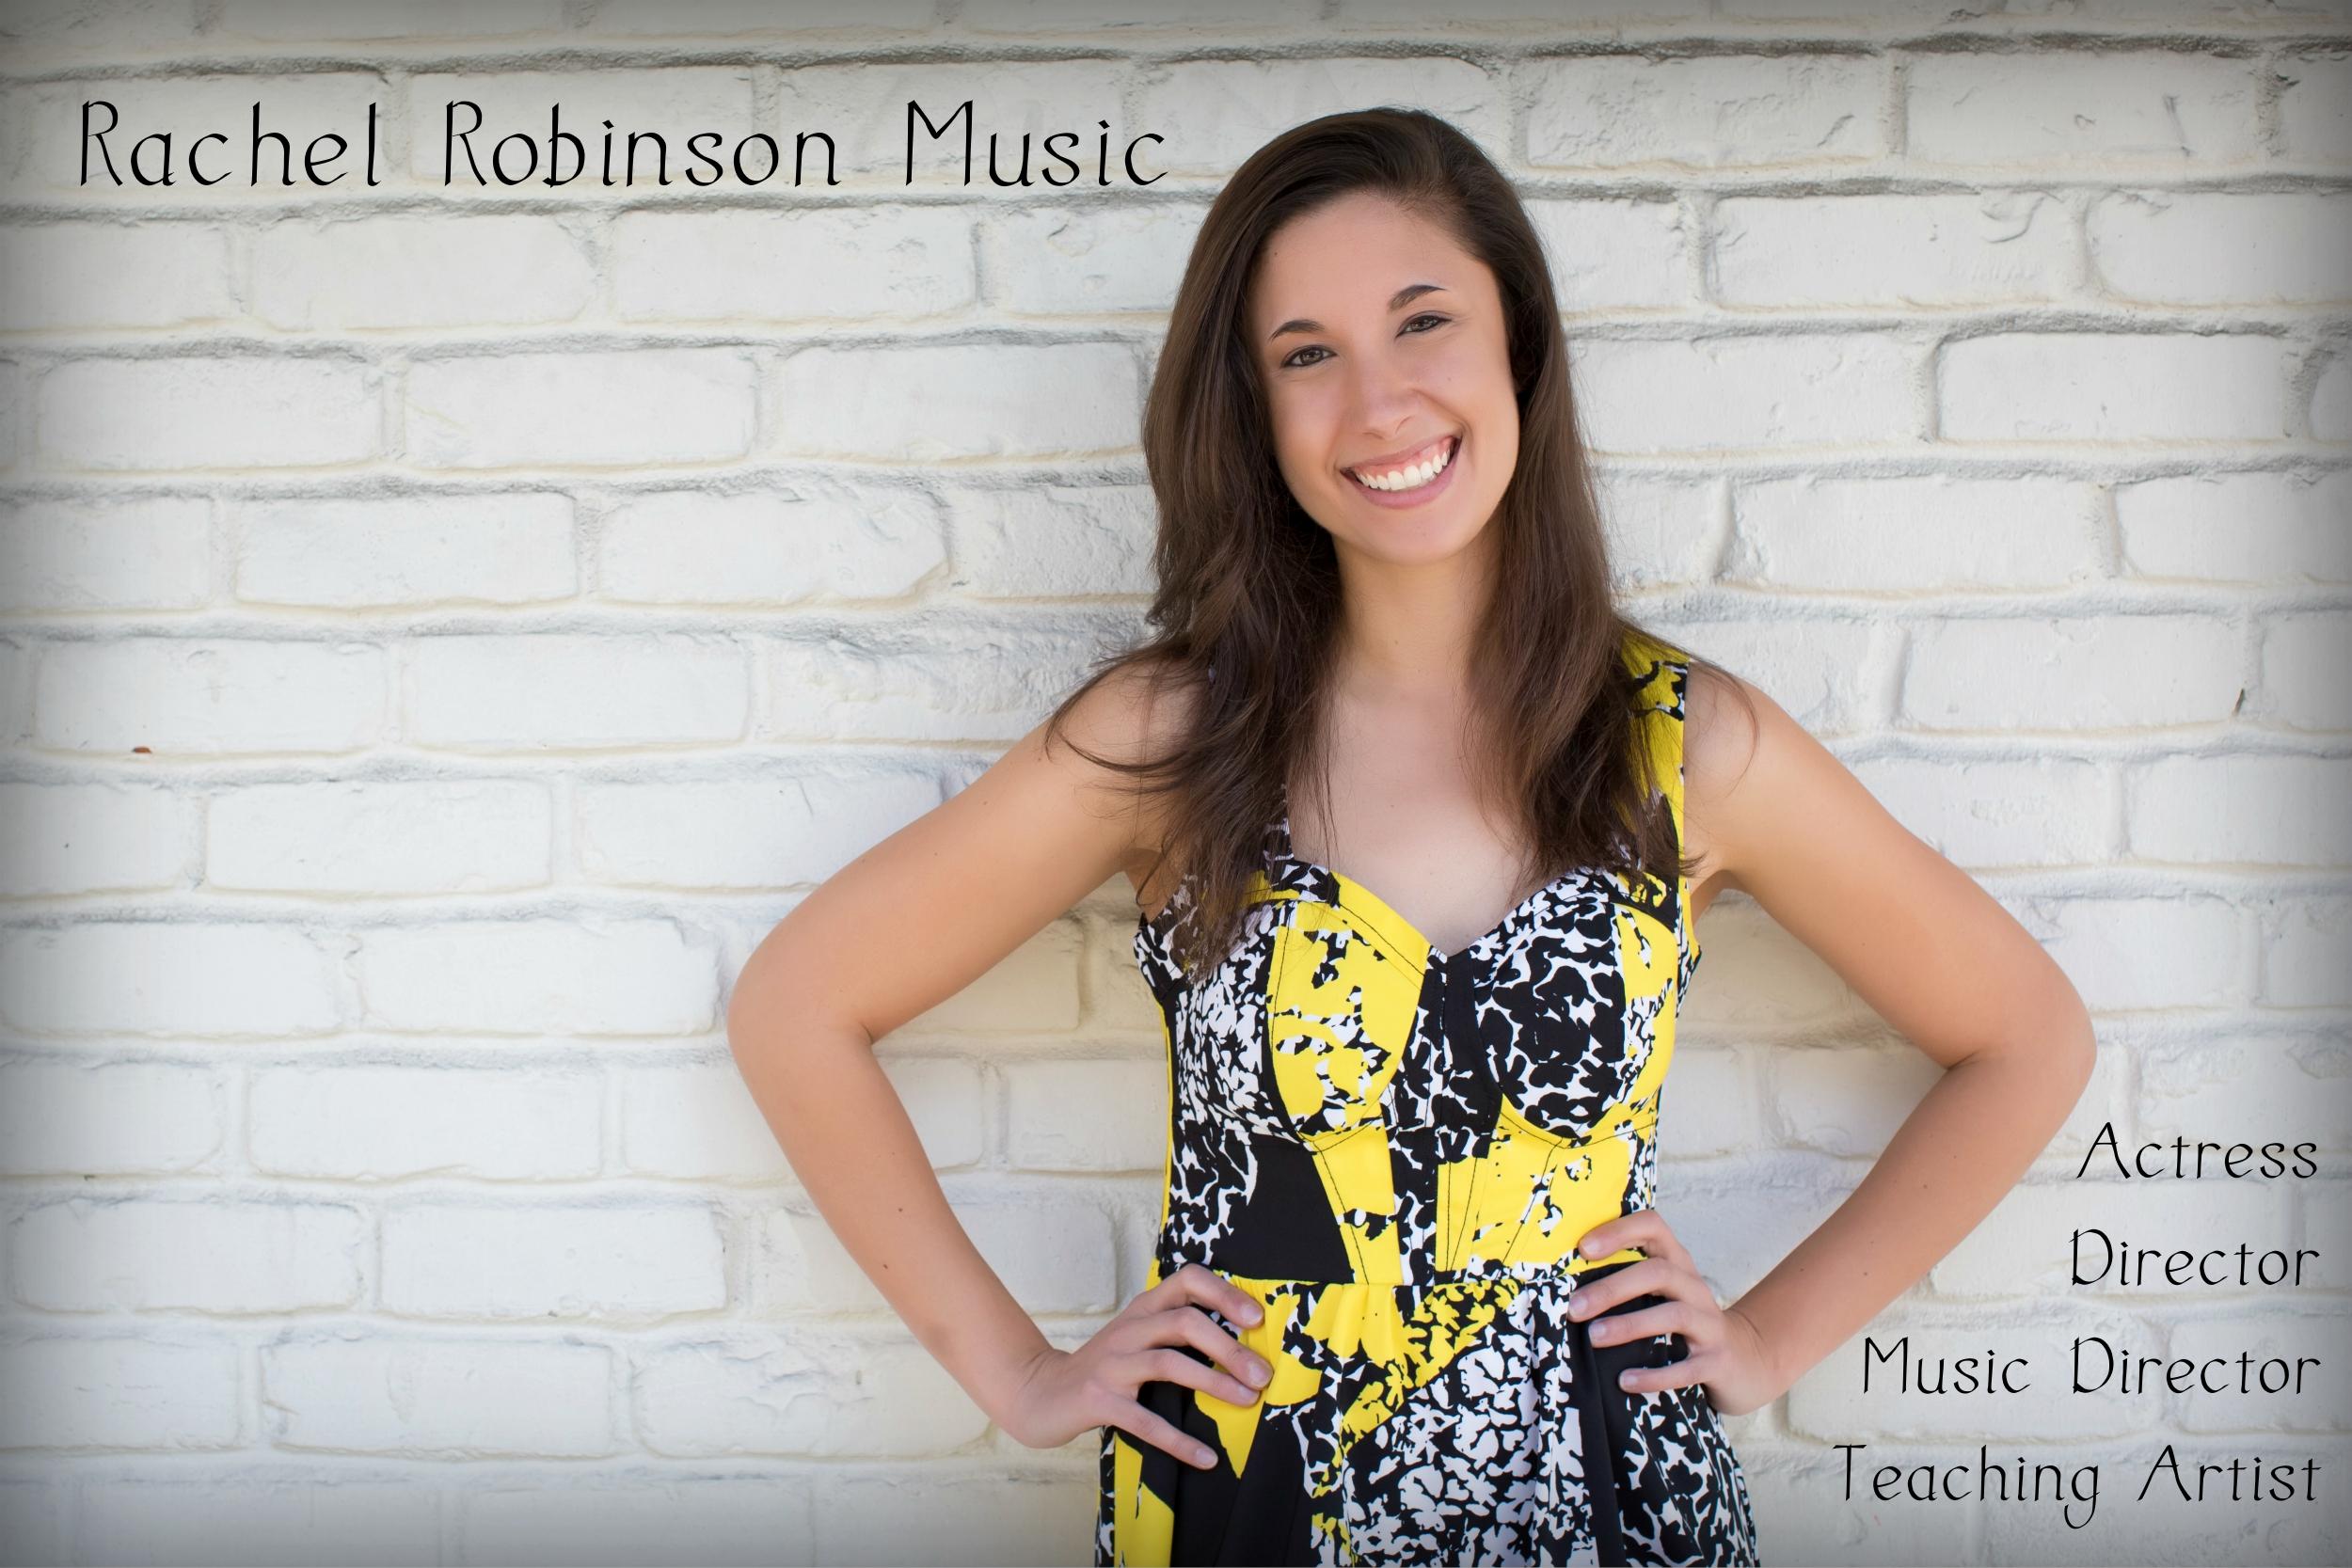 rachel robinson music